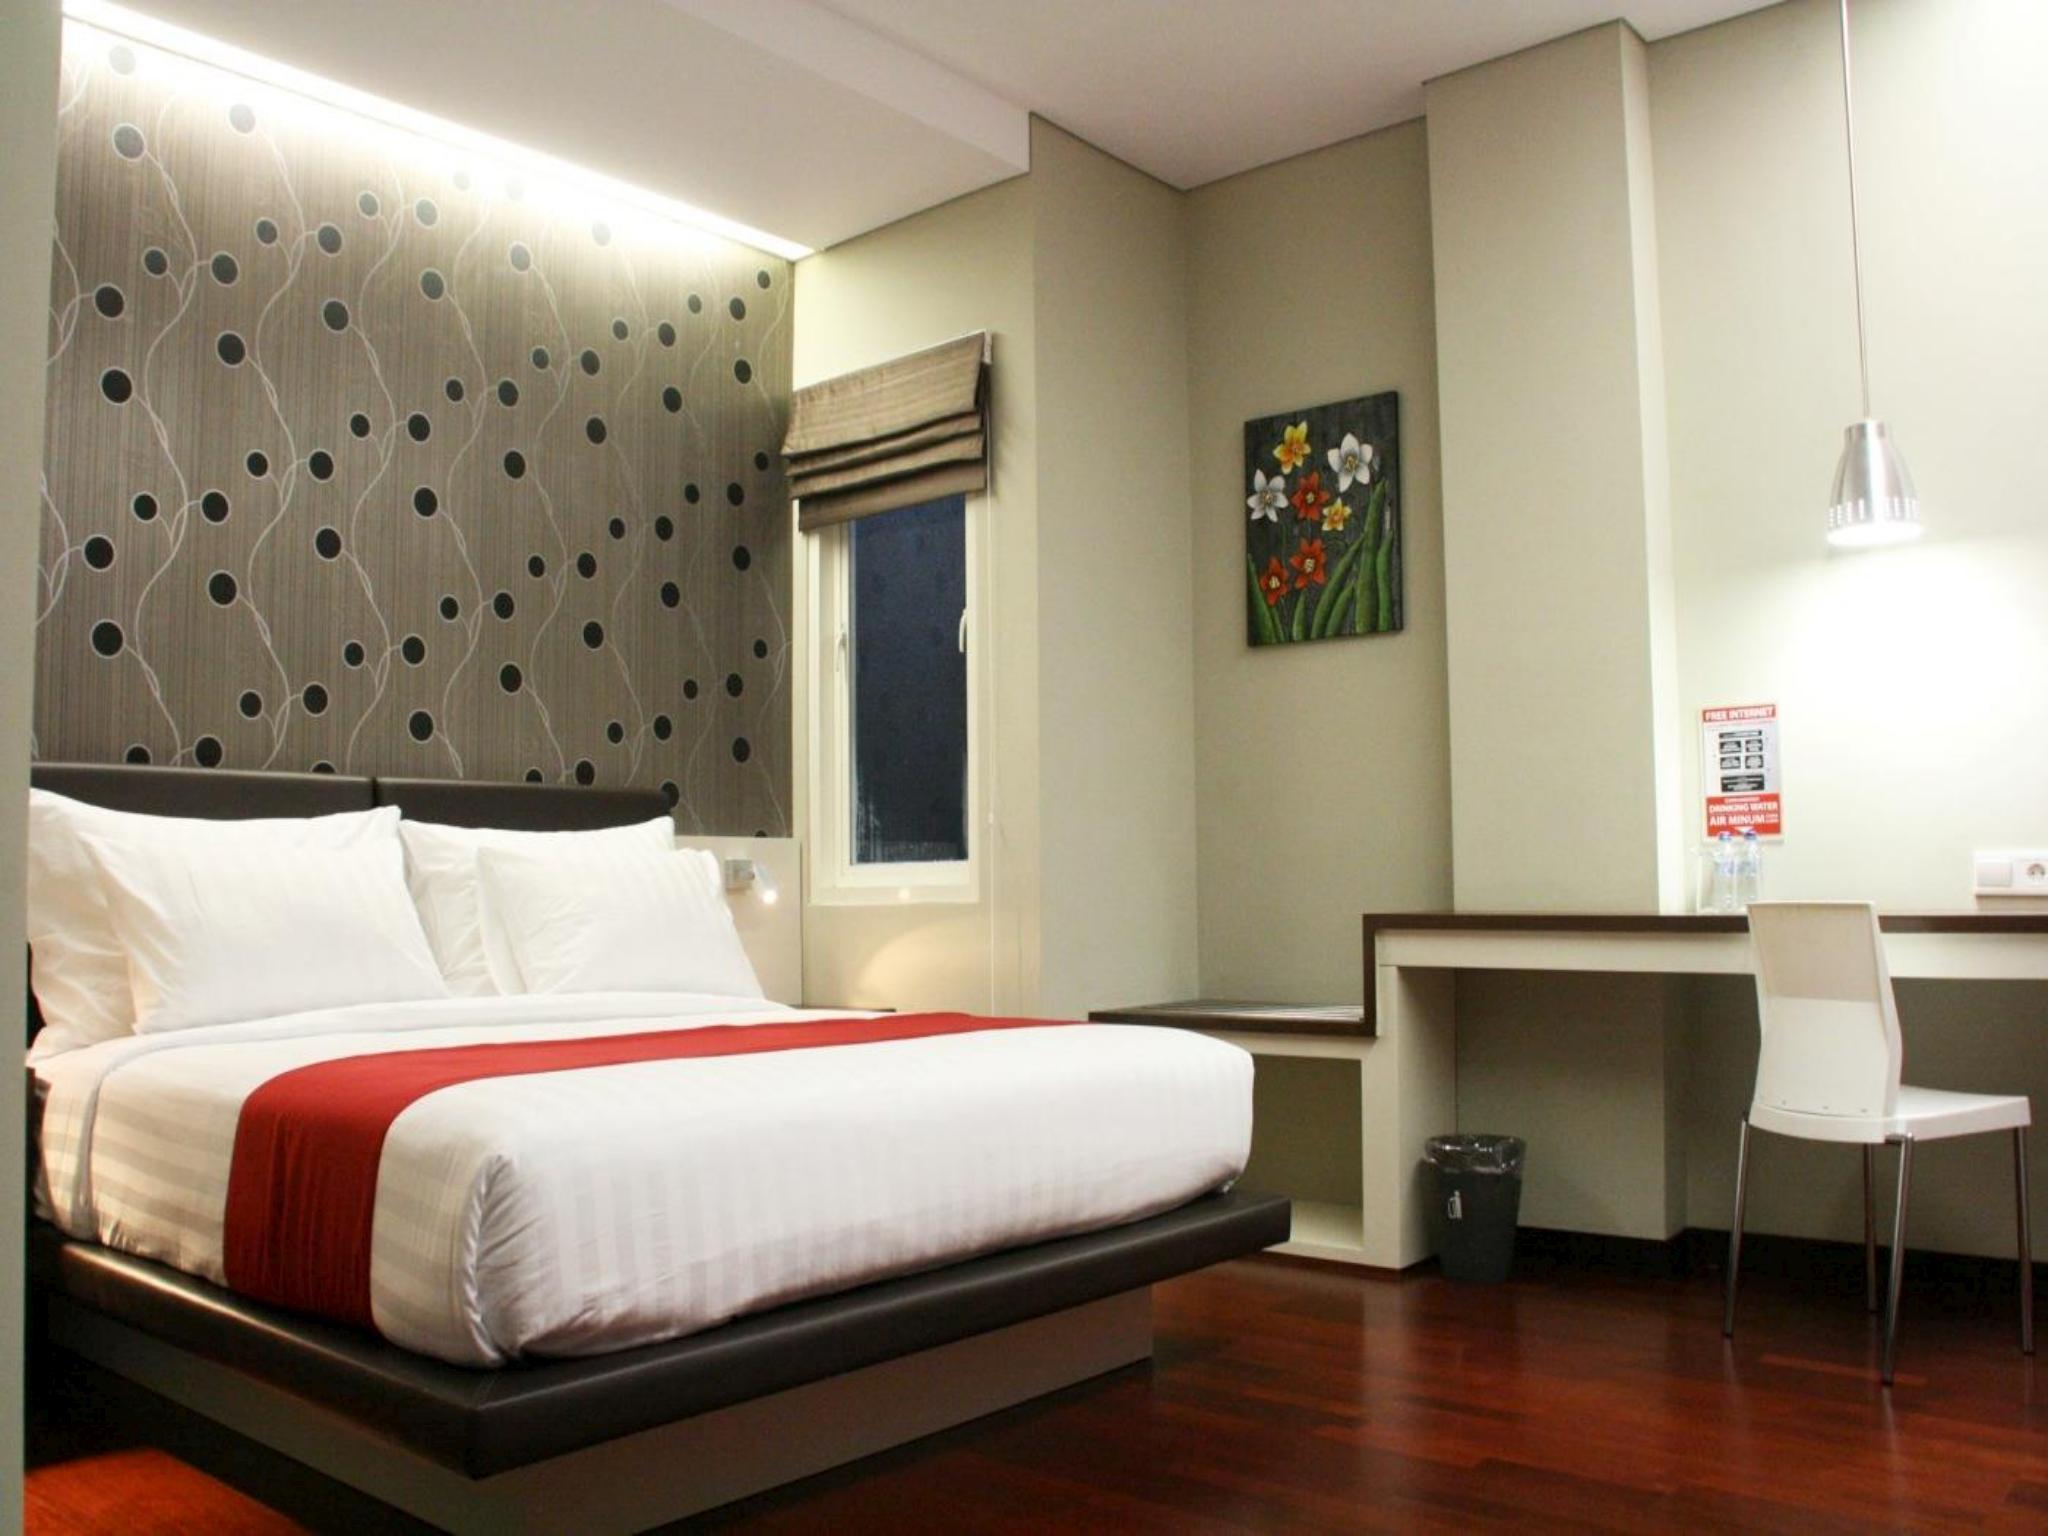 Grand Citihub Hotel at Tunjungan Surabaya